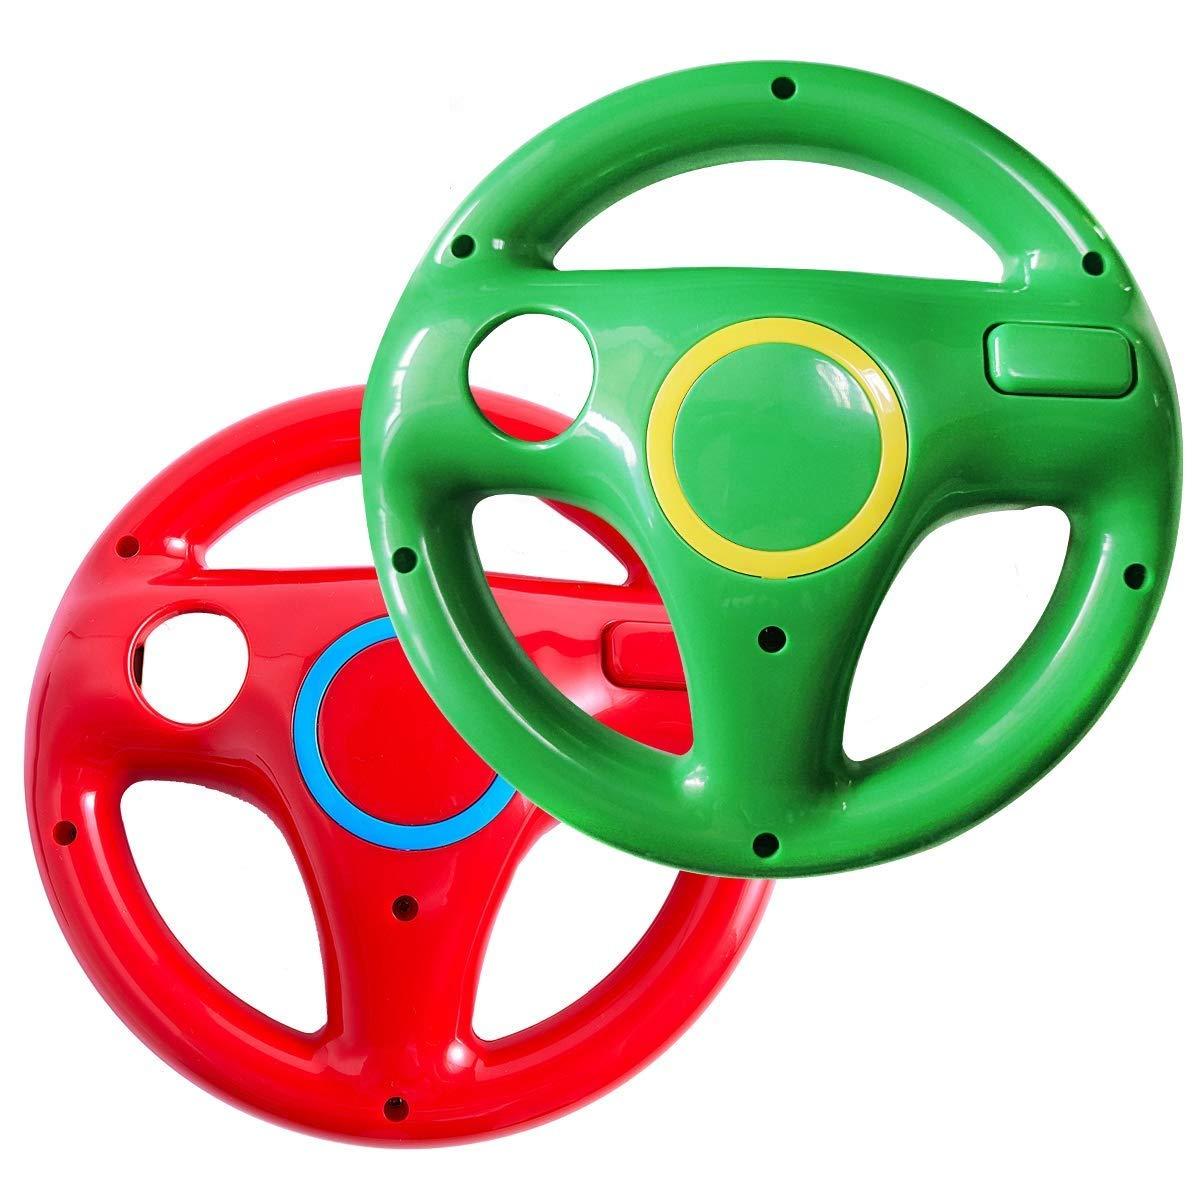 Mario Kart Wii wholesale 2 Pack Racing Direct stock discount Nintend for Wheels